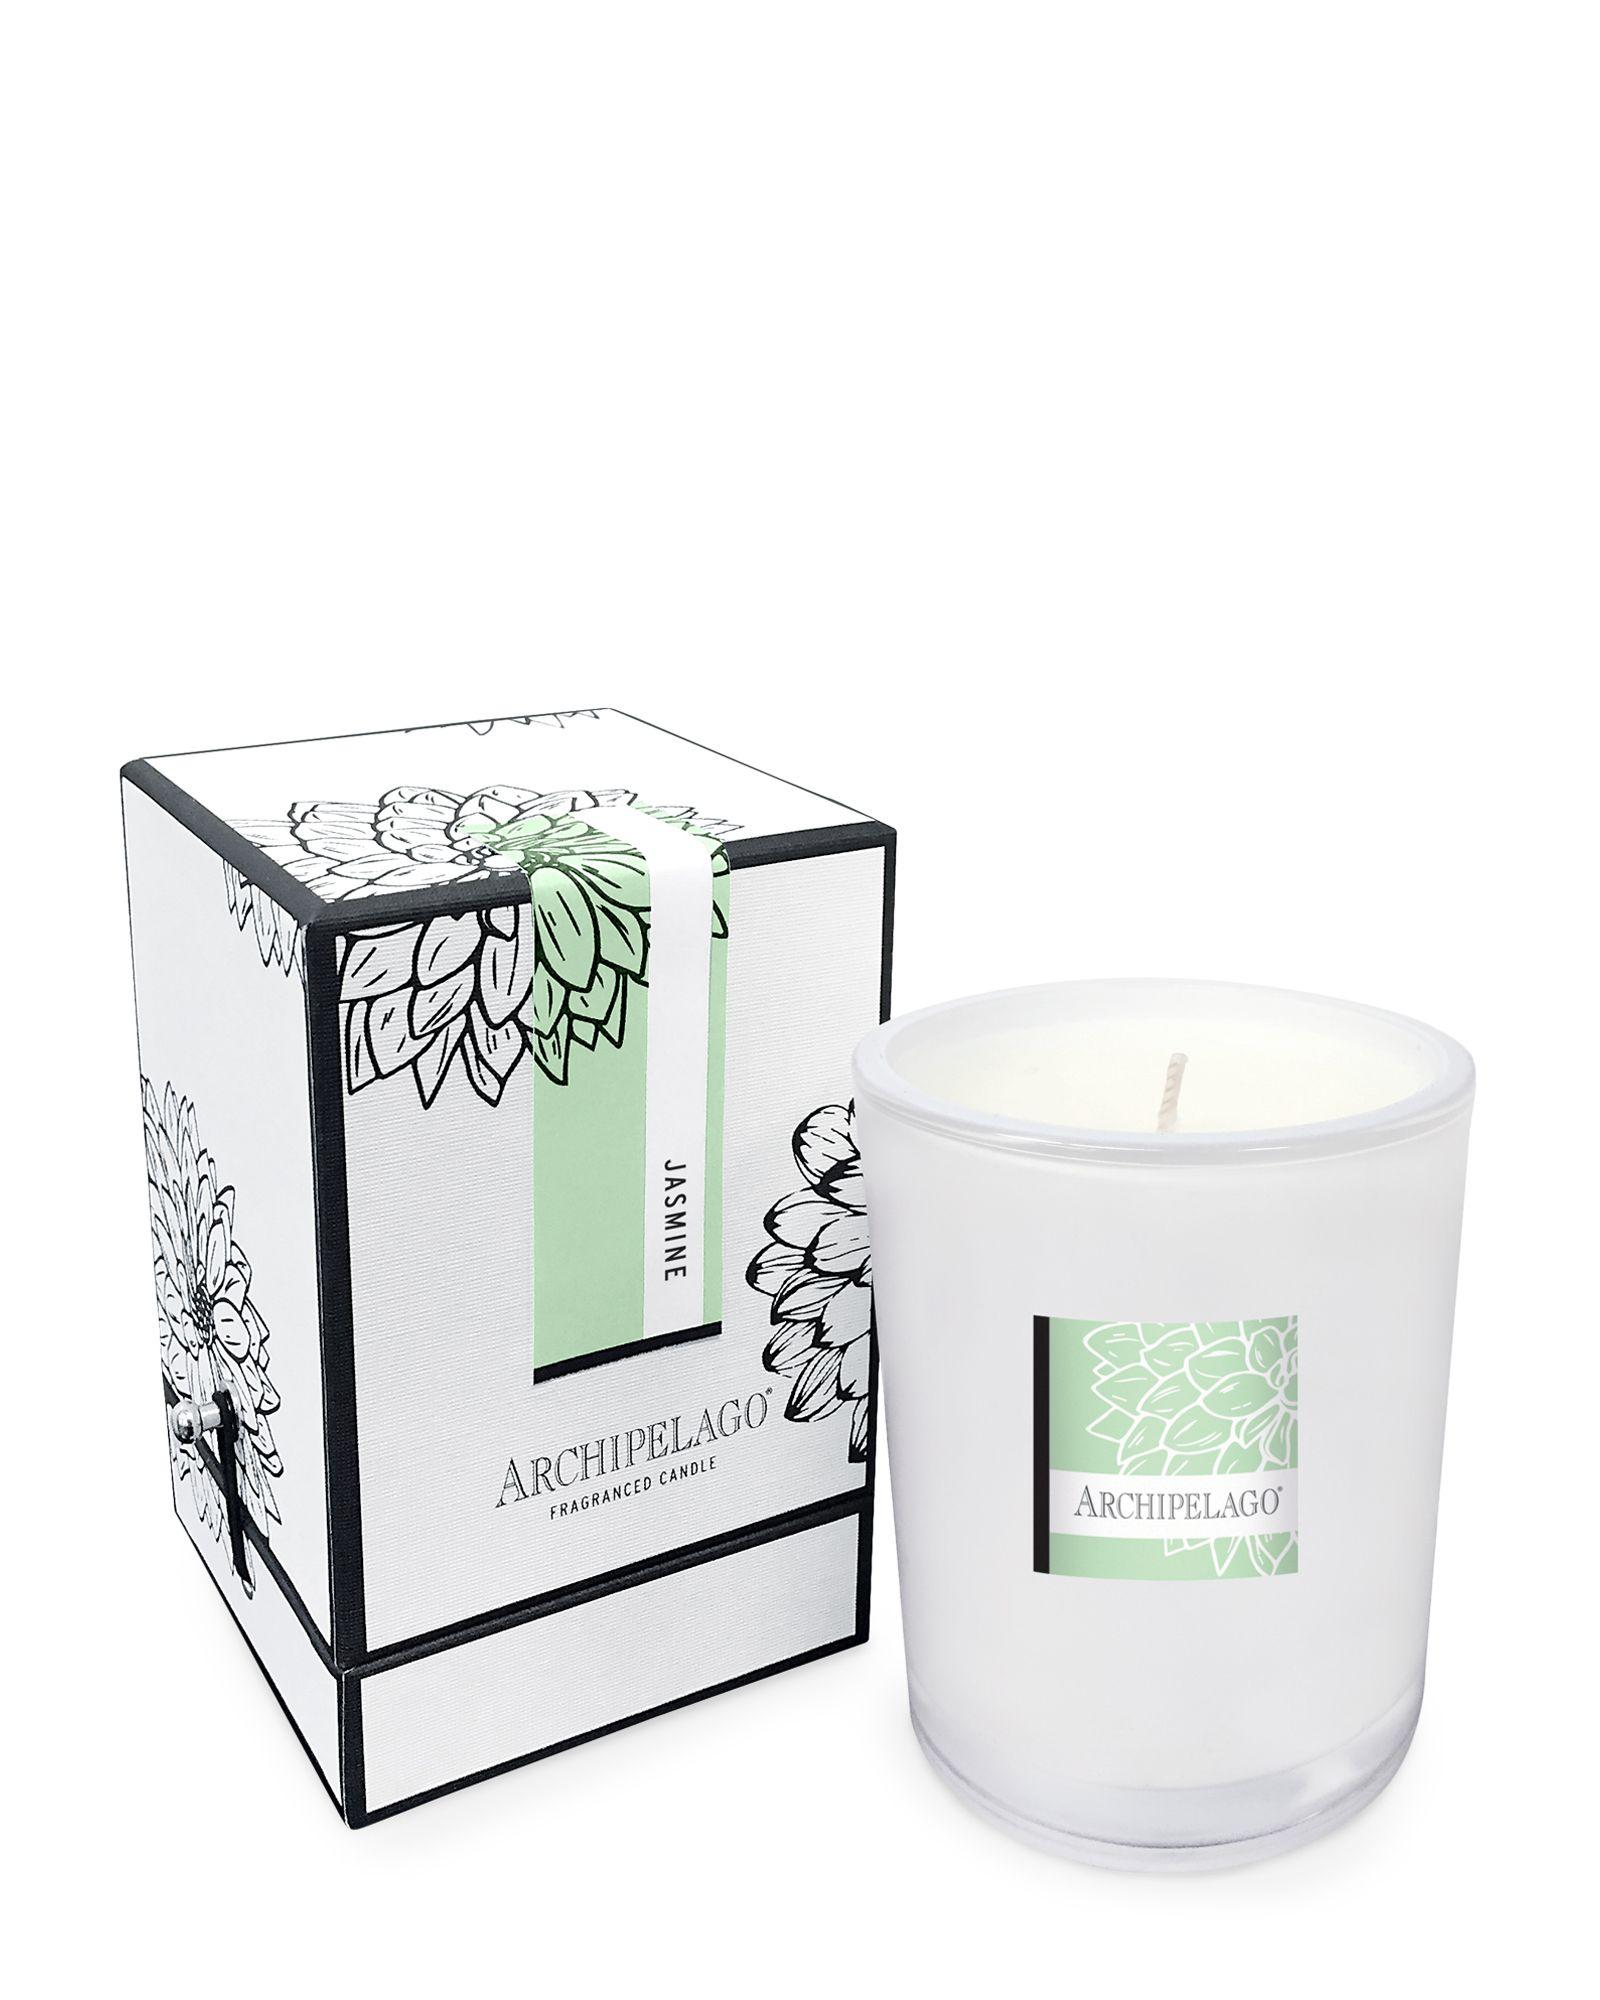 Archipelago Jasmine Hand-Poured Candle